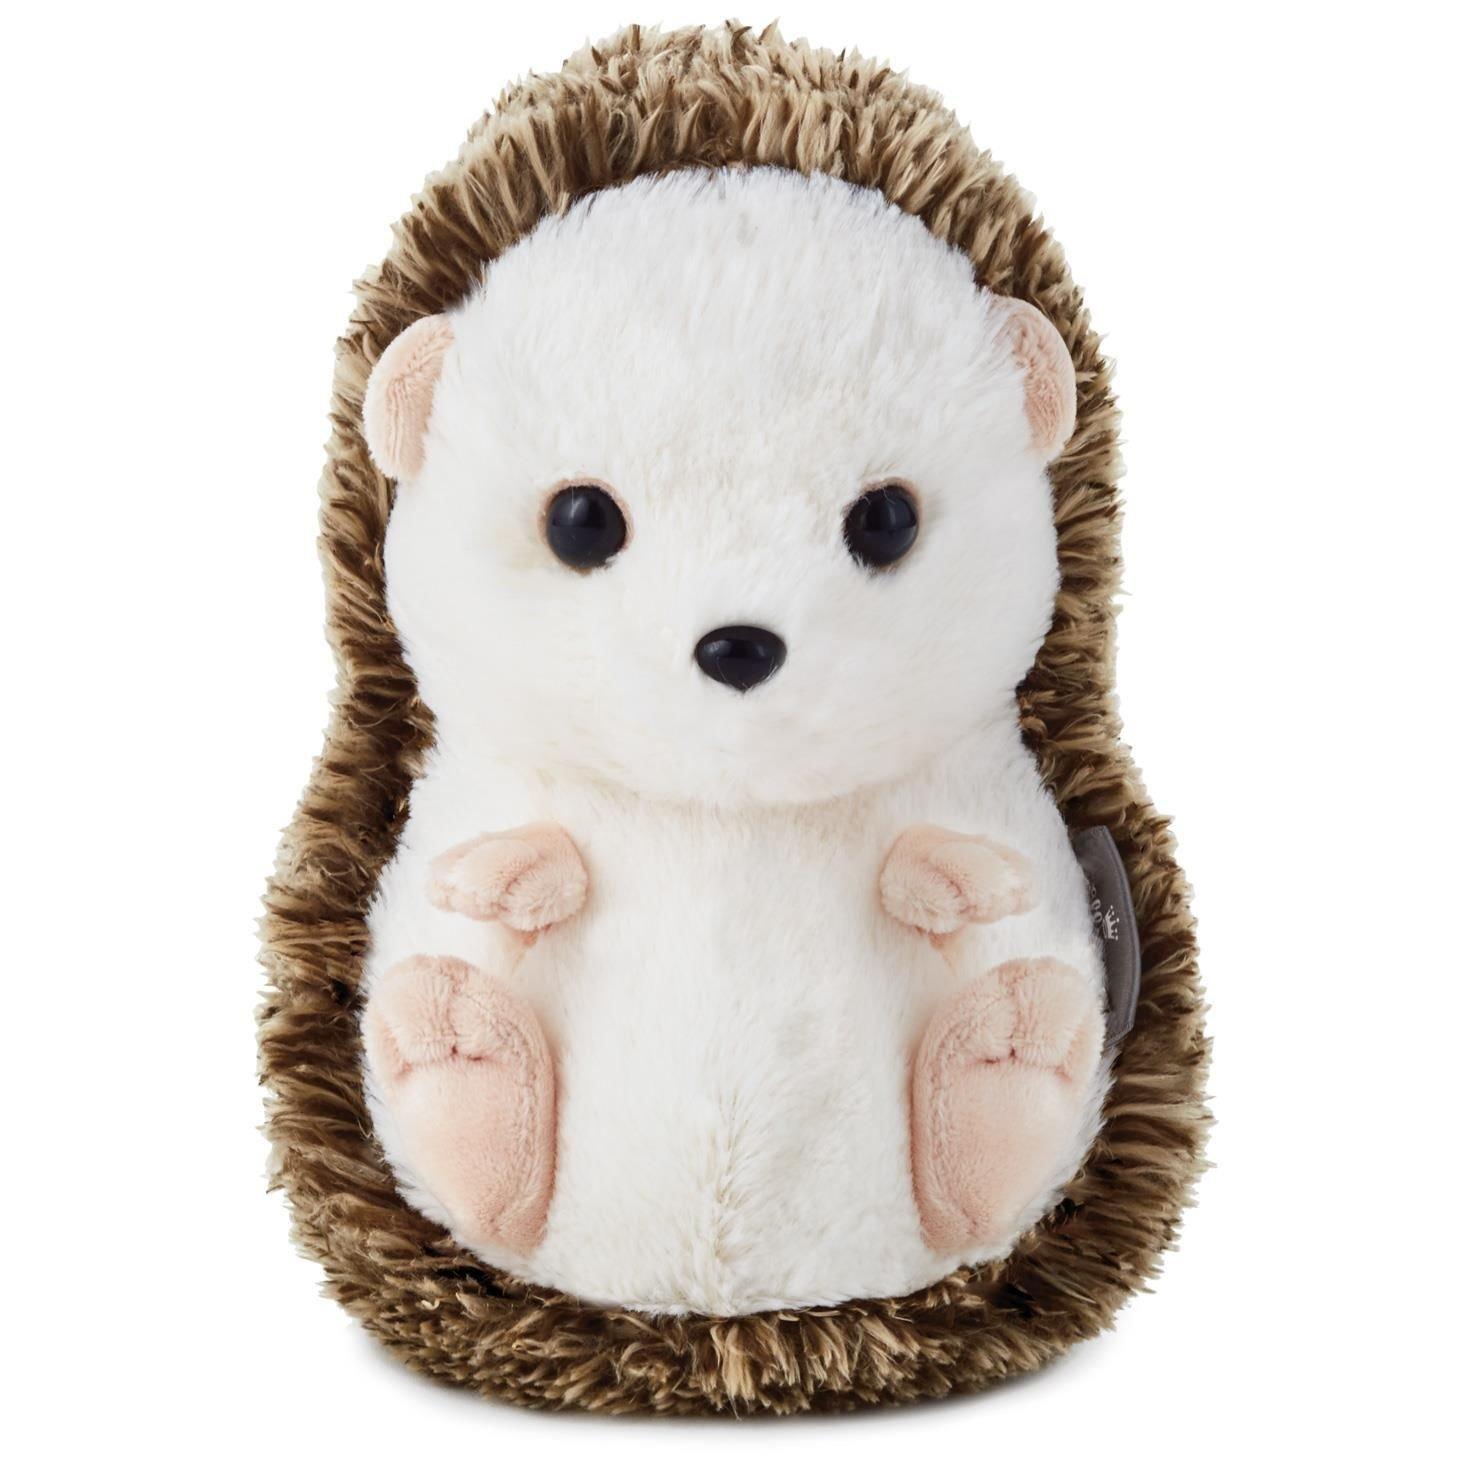 Amazon Com Hallmark Baby Hedgehog Stuffed Animal 7 5 Classic